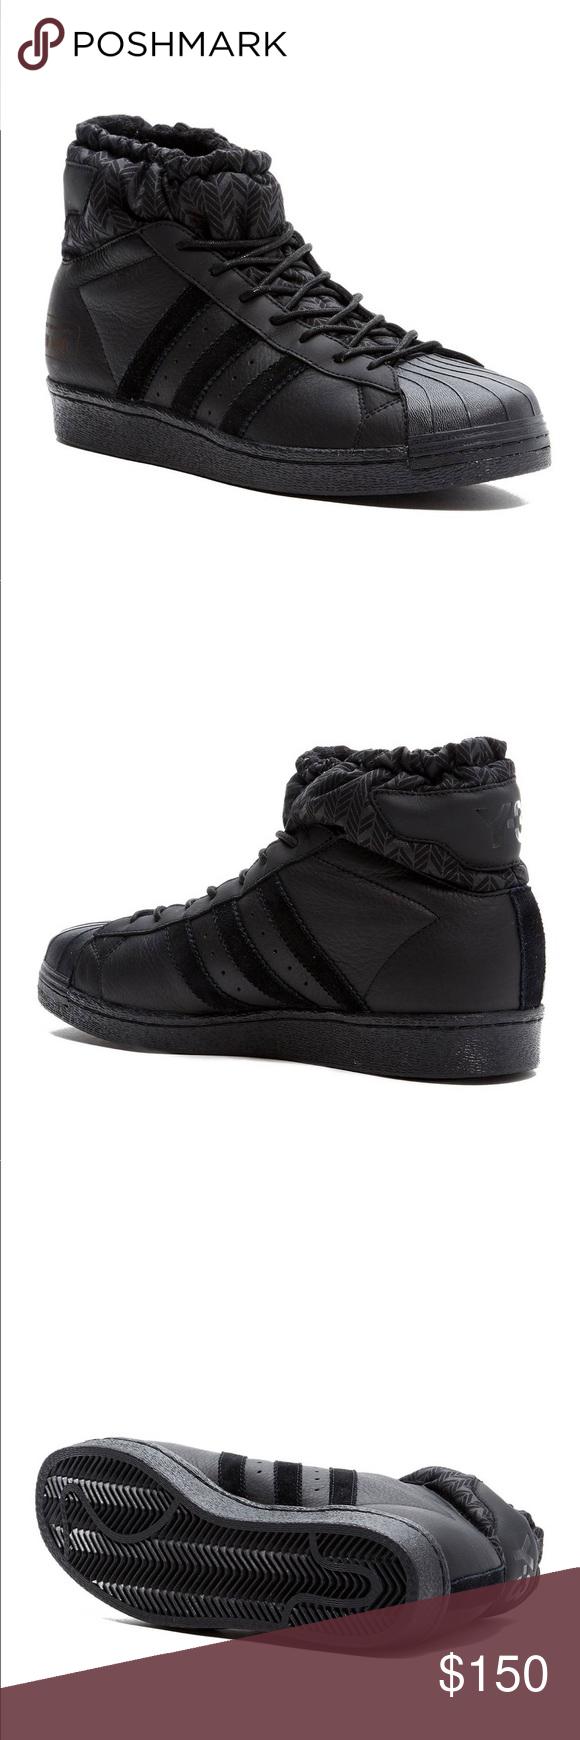 b588406810af7 Snow Model All Black Y-3 Hightop Sneakers Brand New. Box